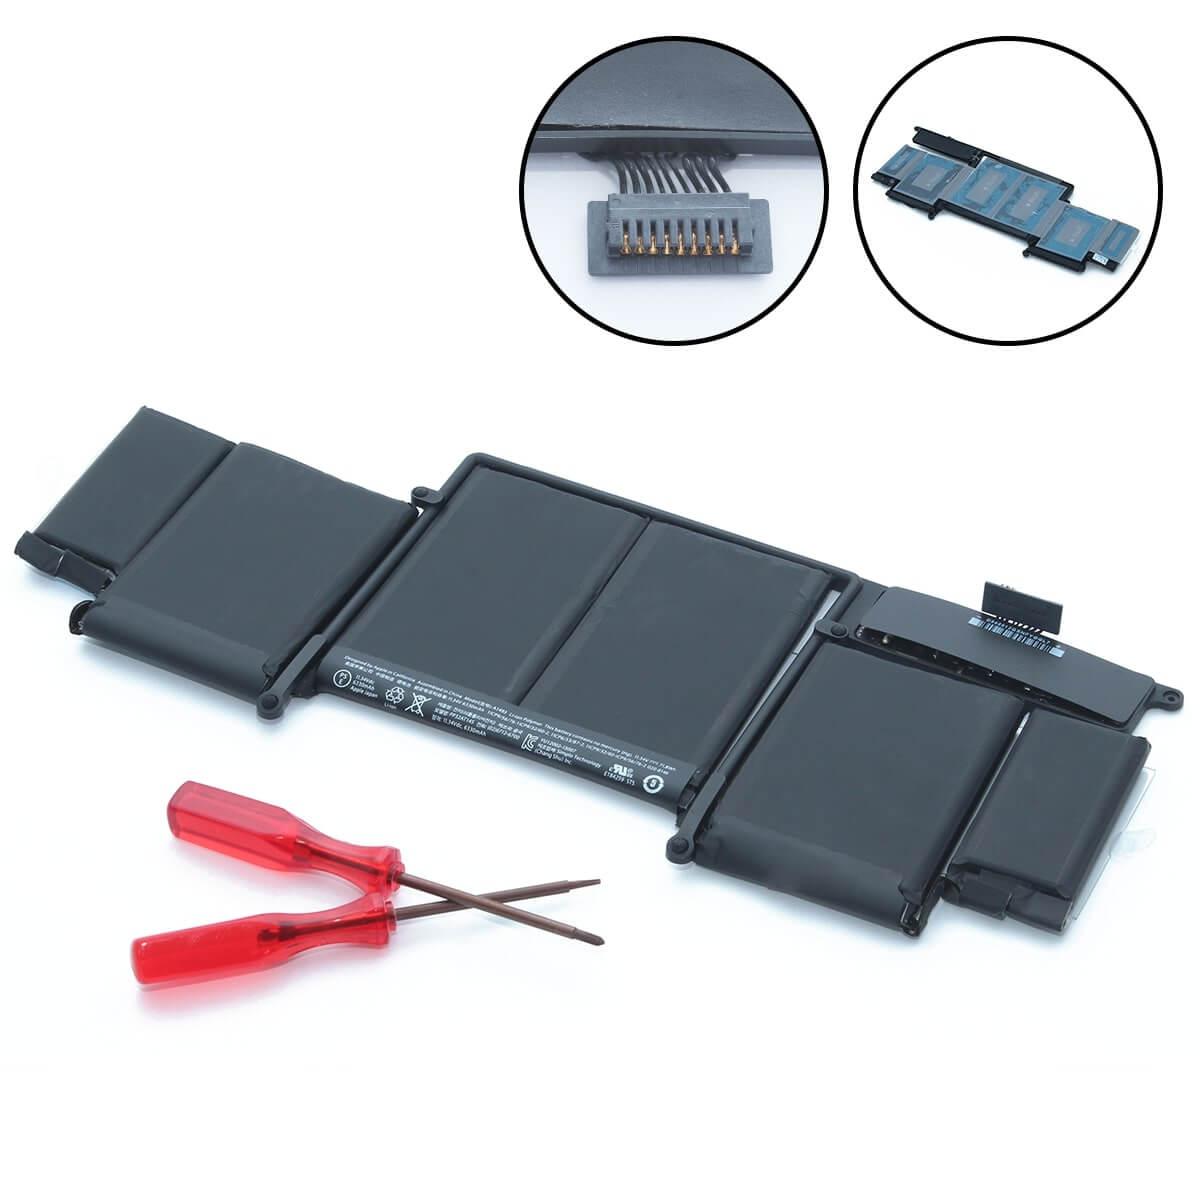 батарея для macbook pro 13 2013, 2014 a1493, батарея для a1502